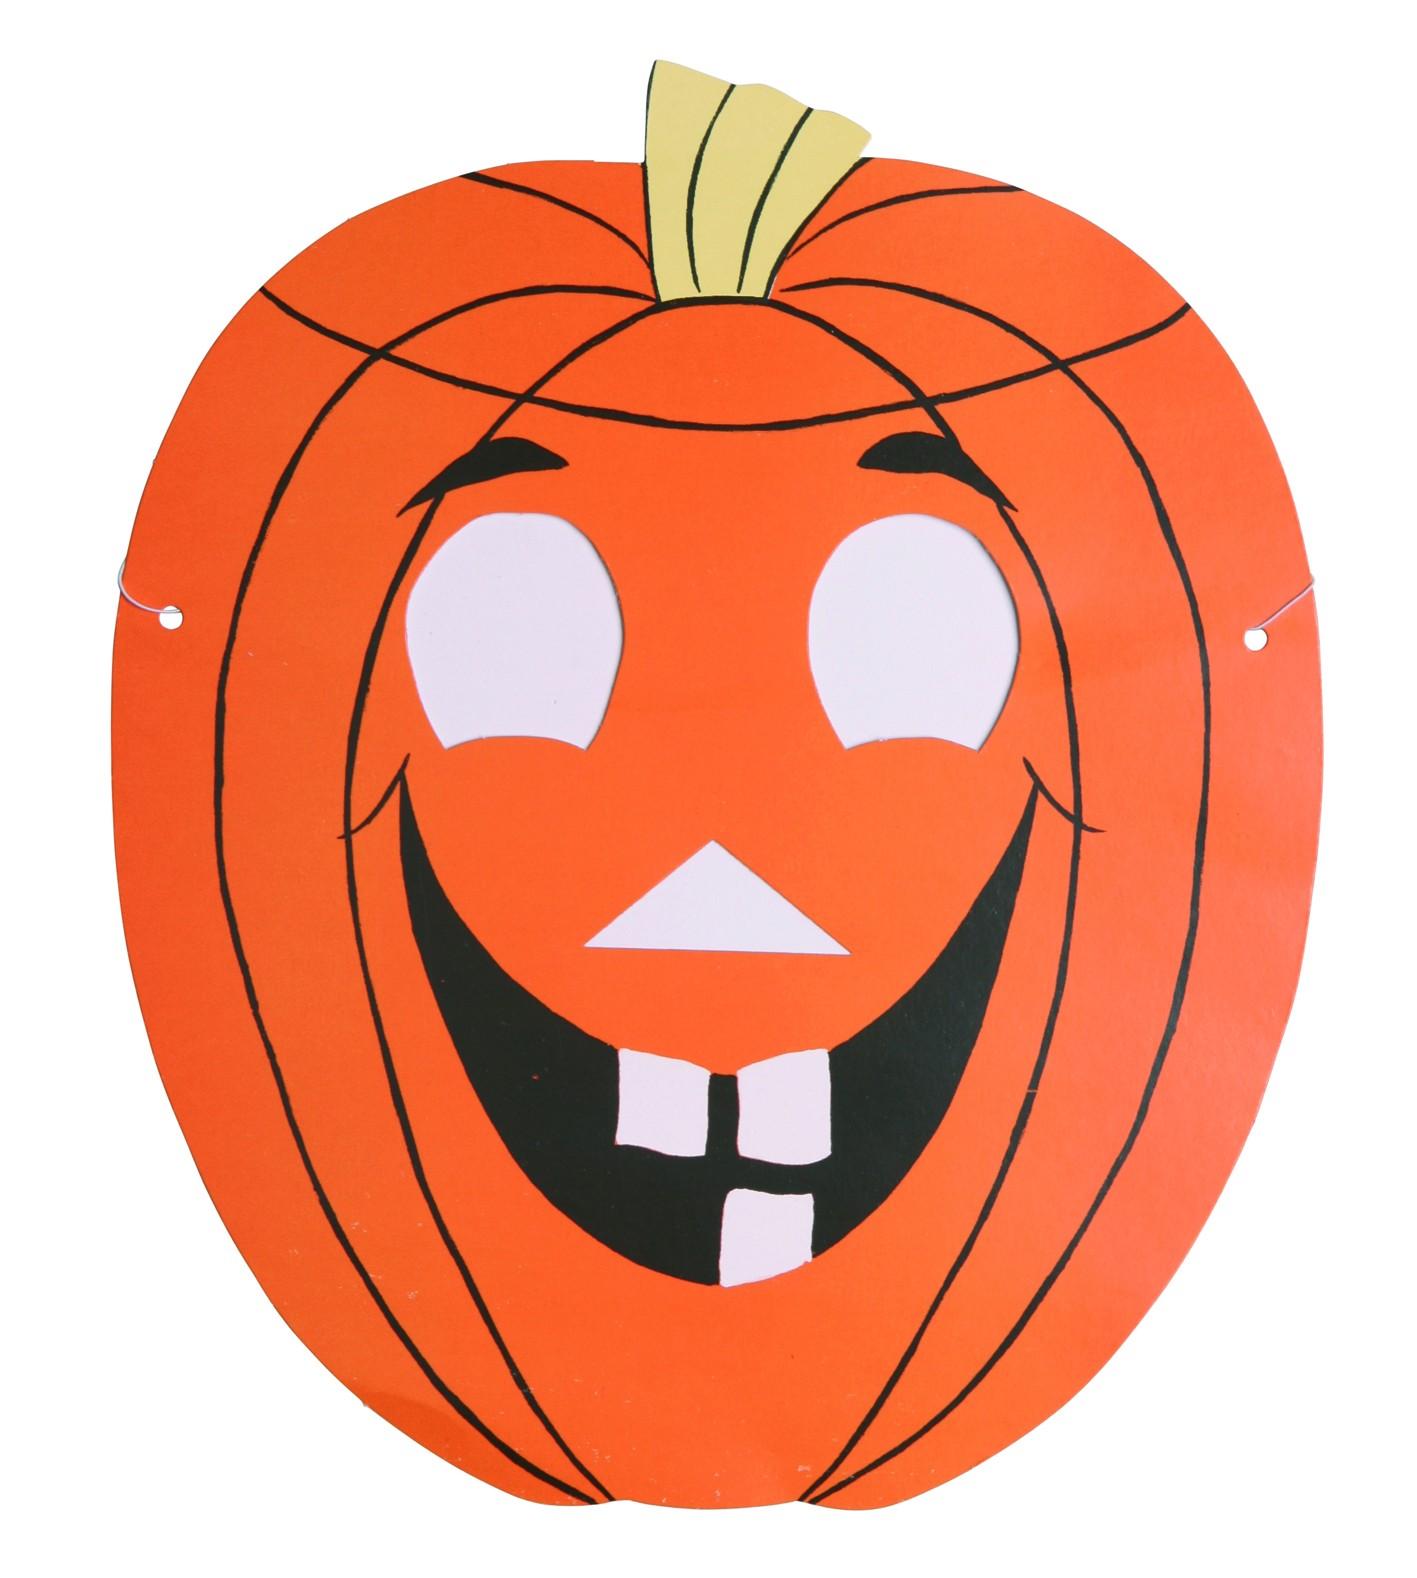 Werbeartikel: Halloween Artikel,=Funny mask Halloween